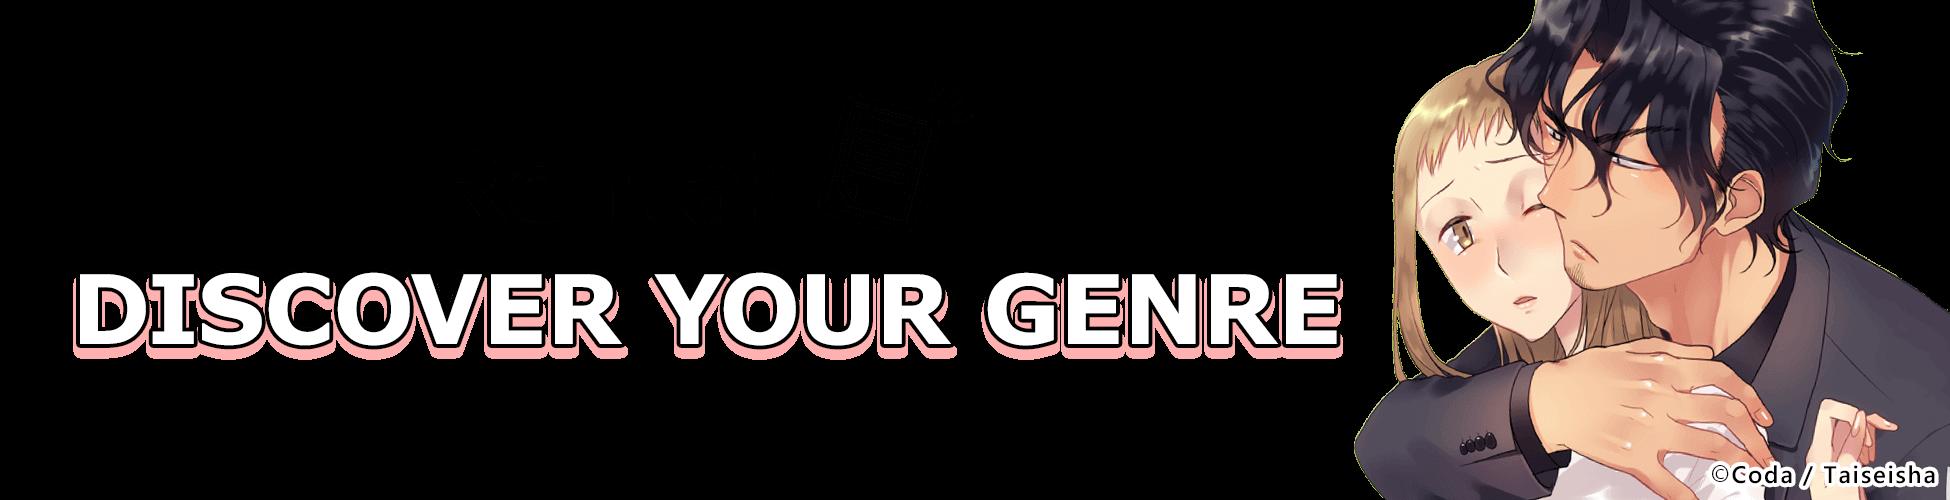 Renta! DISCOVER YOUR GENRE